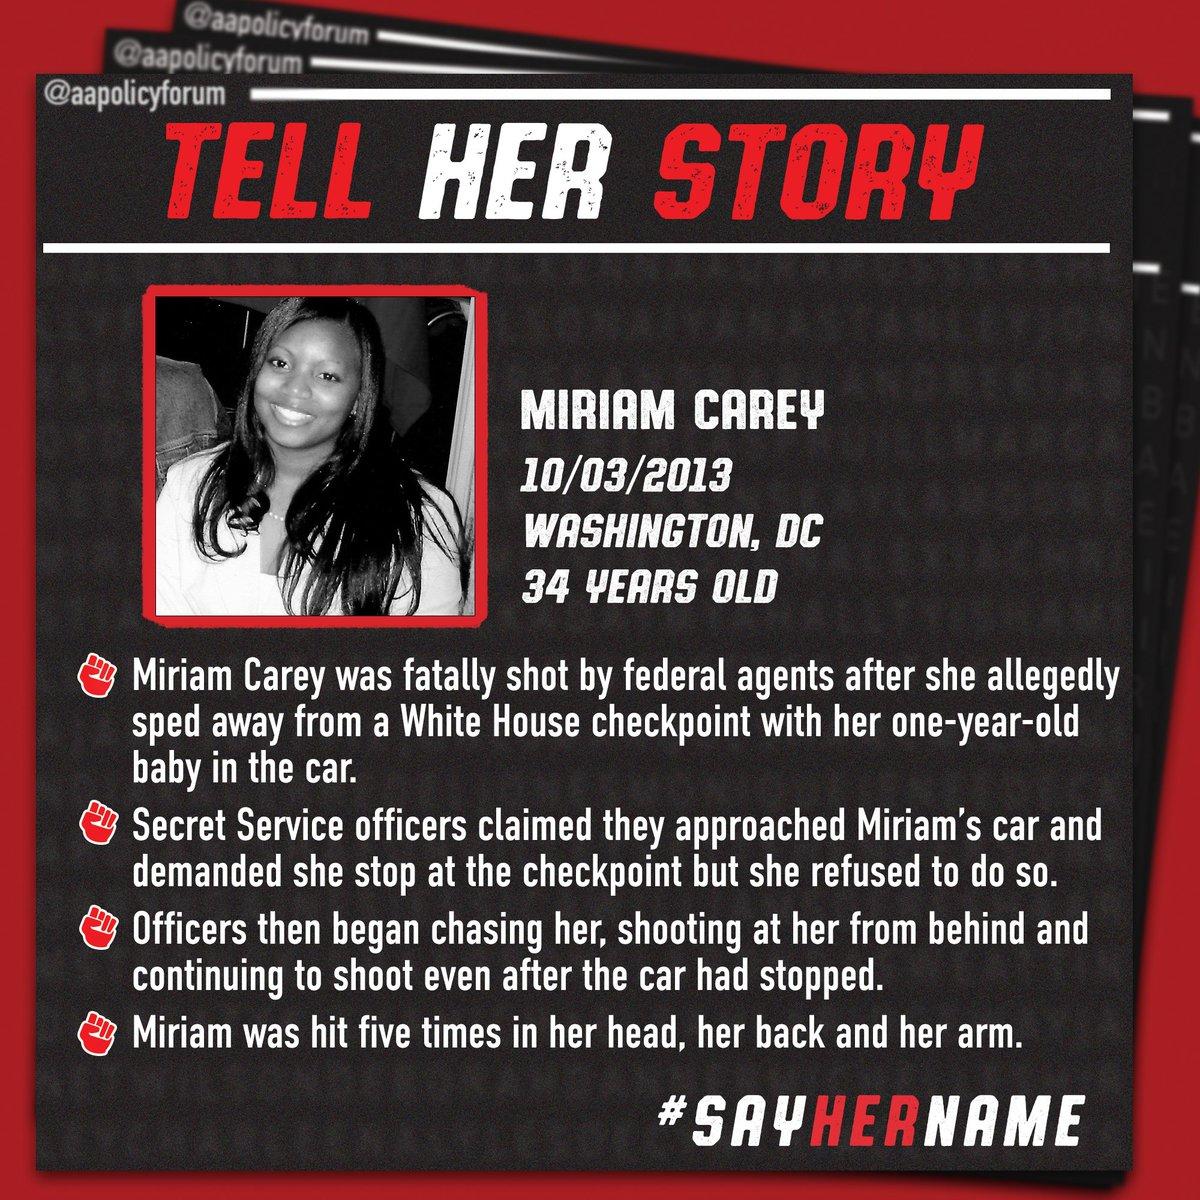 #UnderTheBlacklight uplifting Miriam Carey. #SayHerName.